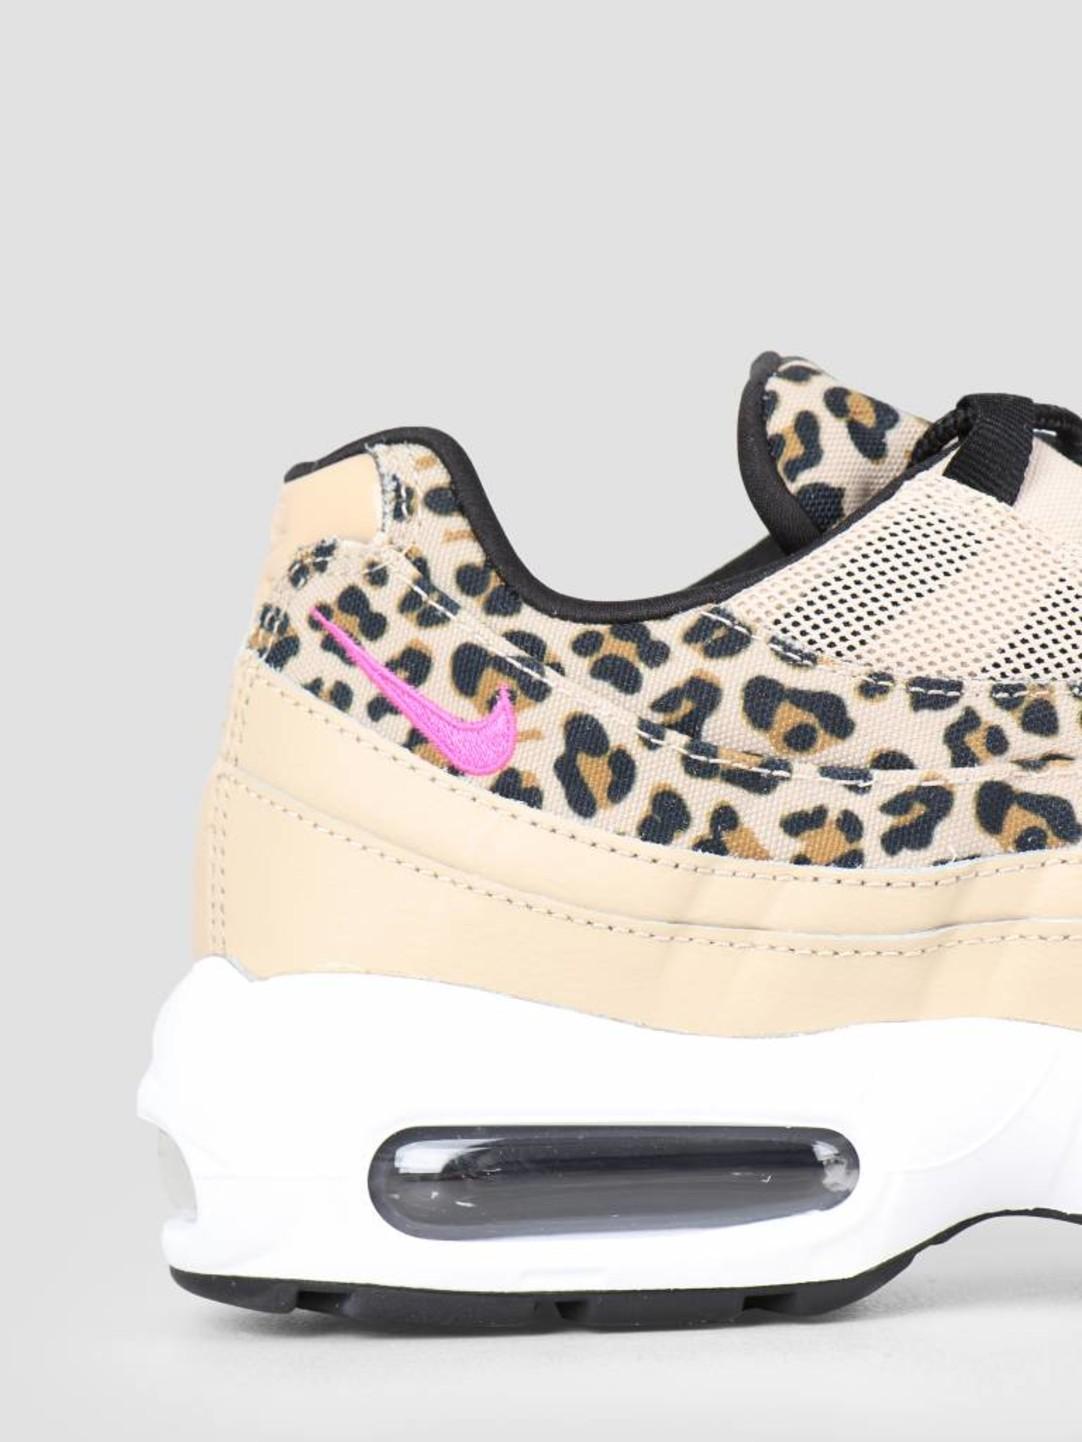 Nike Nike Air Max 95 Prm Desert Ore Laser Fuchsia Black Wheat Cd0180-200